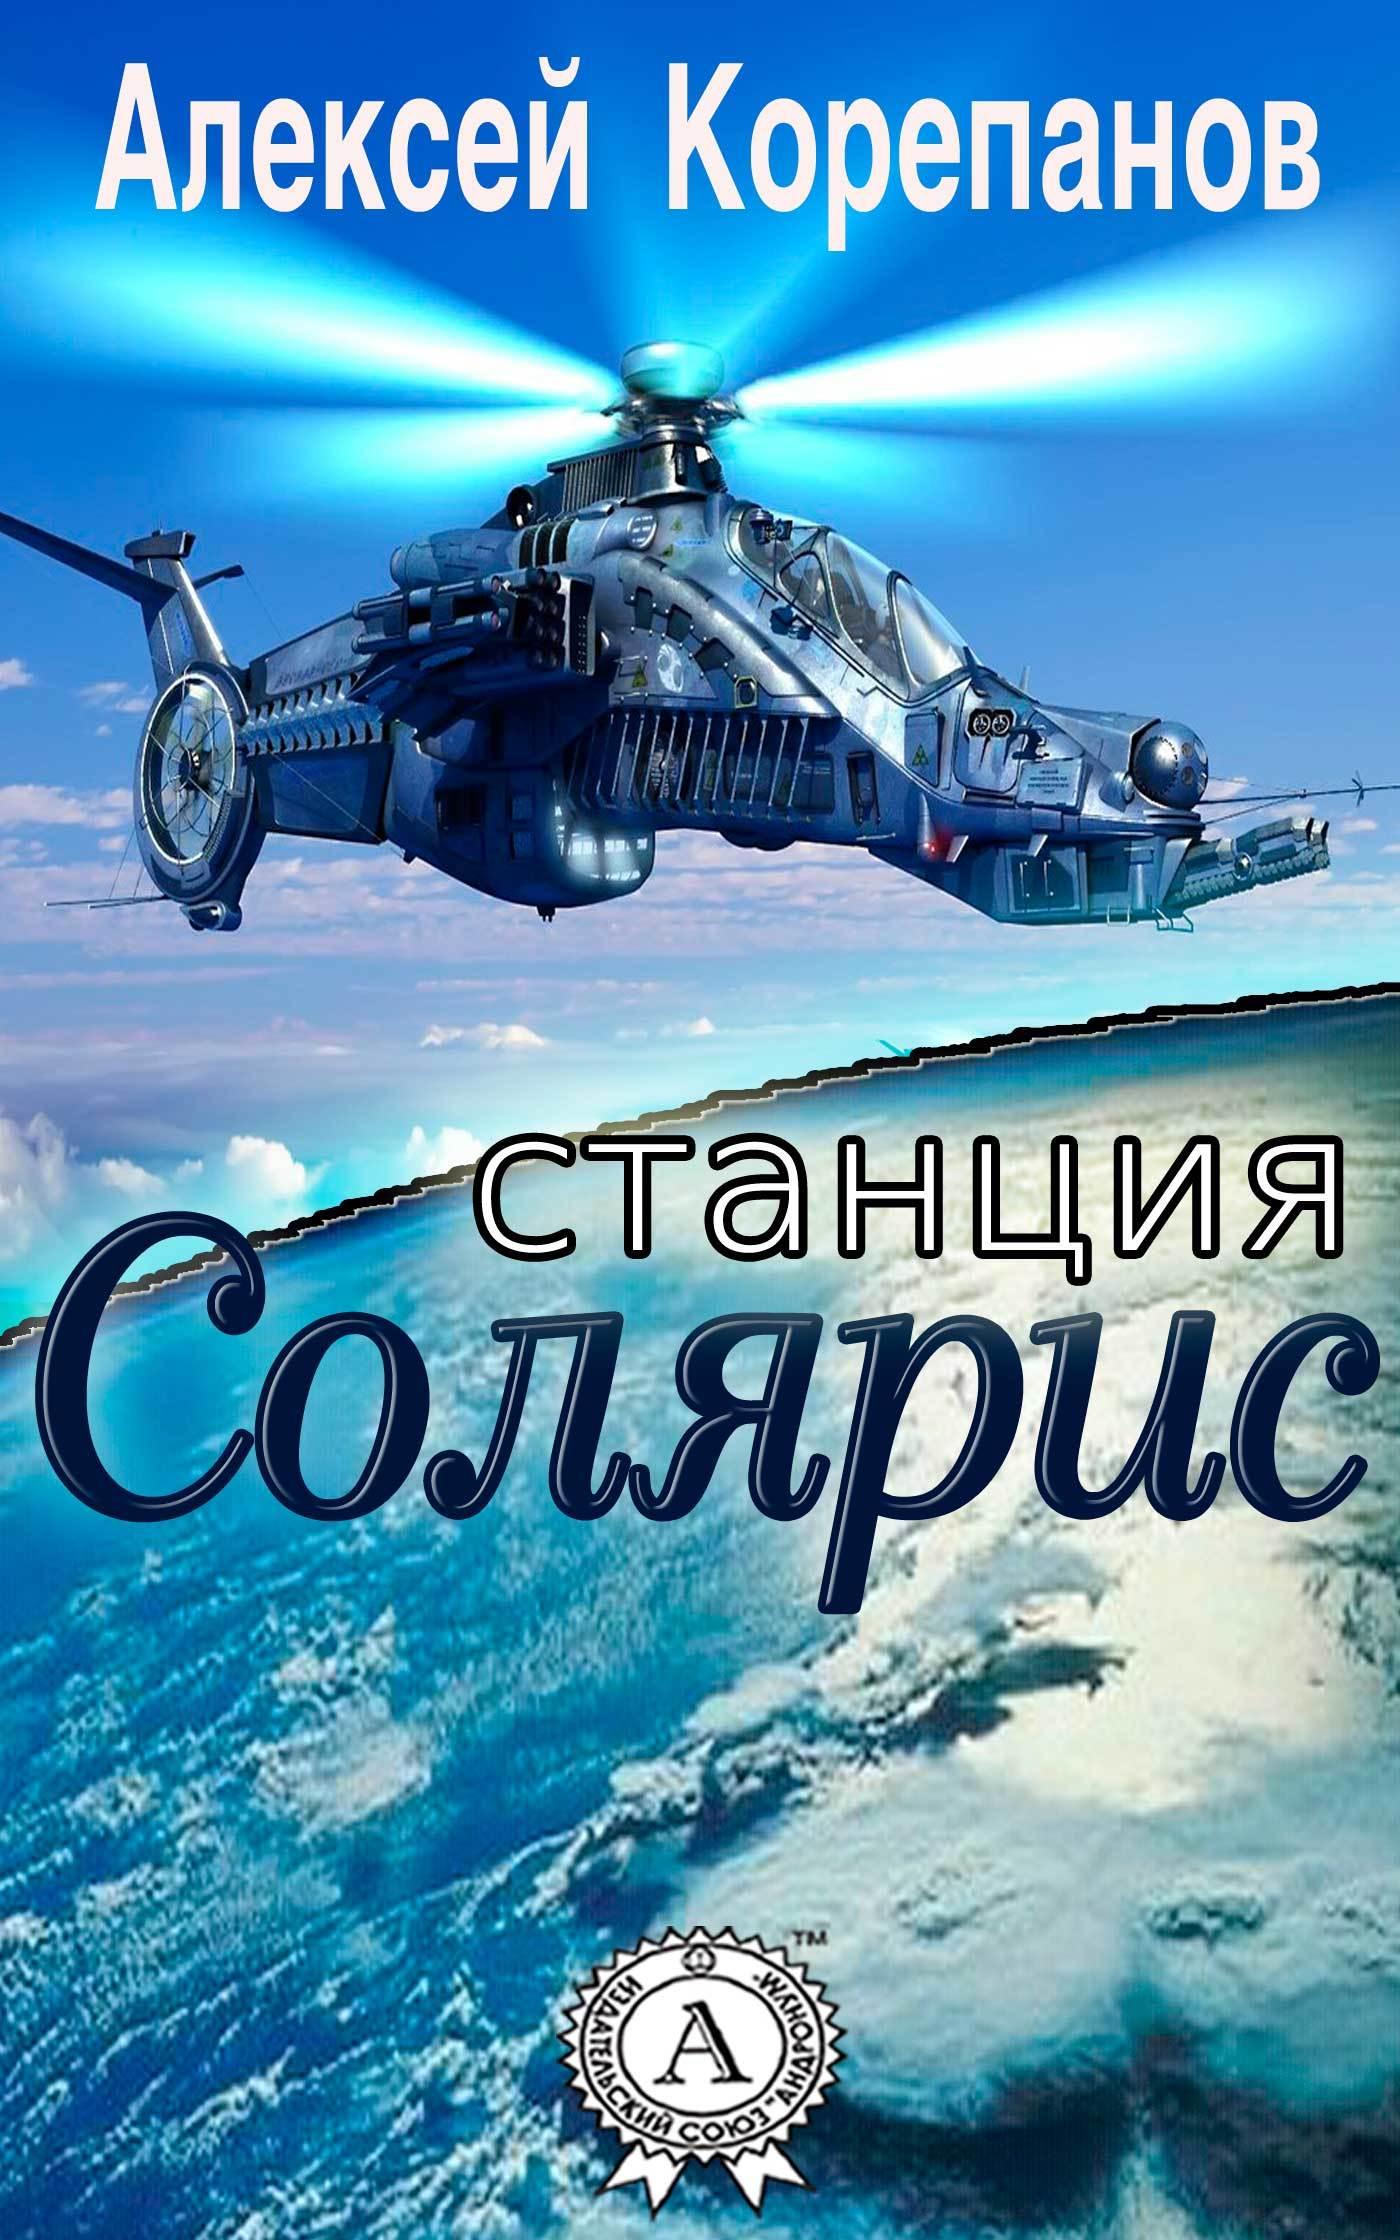 Алексей Корепанов Станция Солярис стенка солярис 3